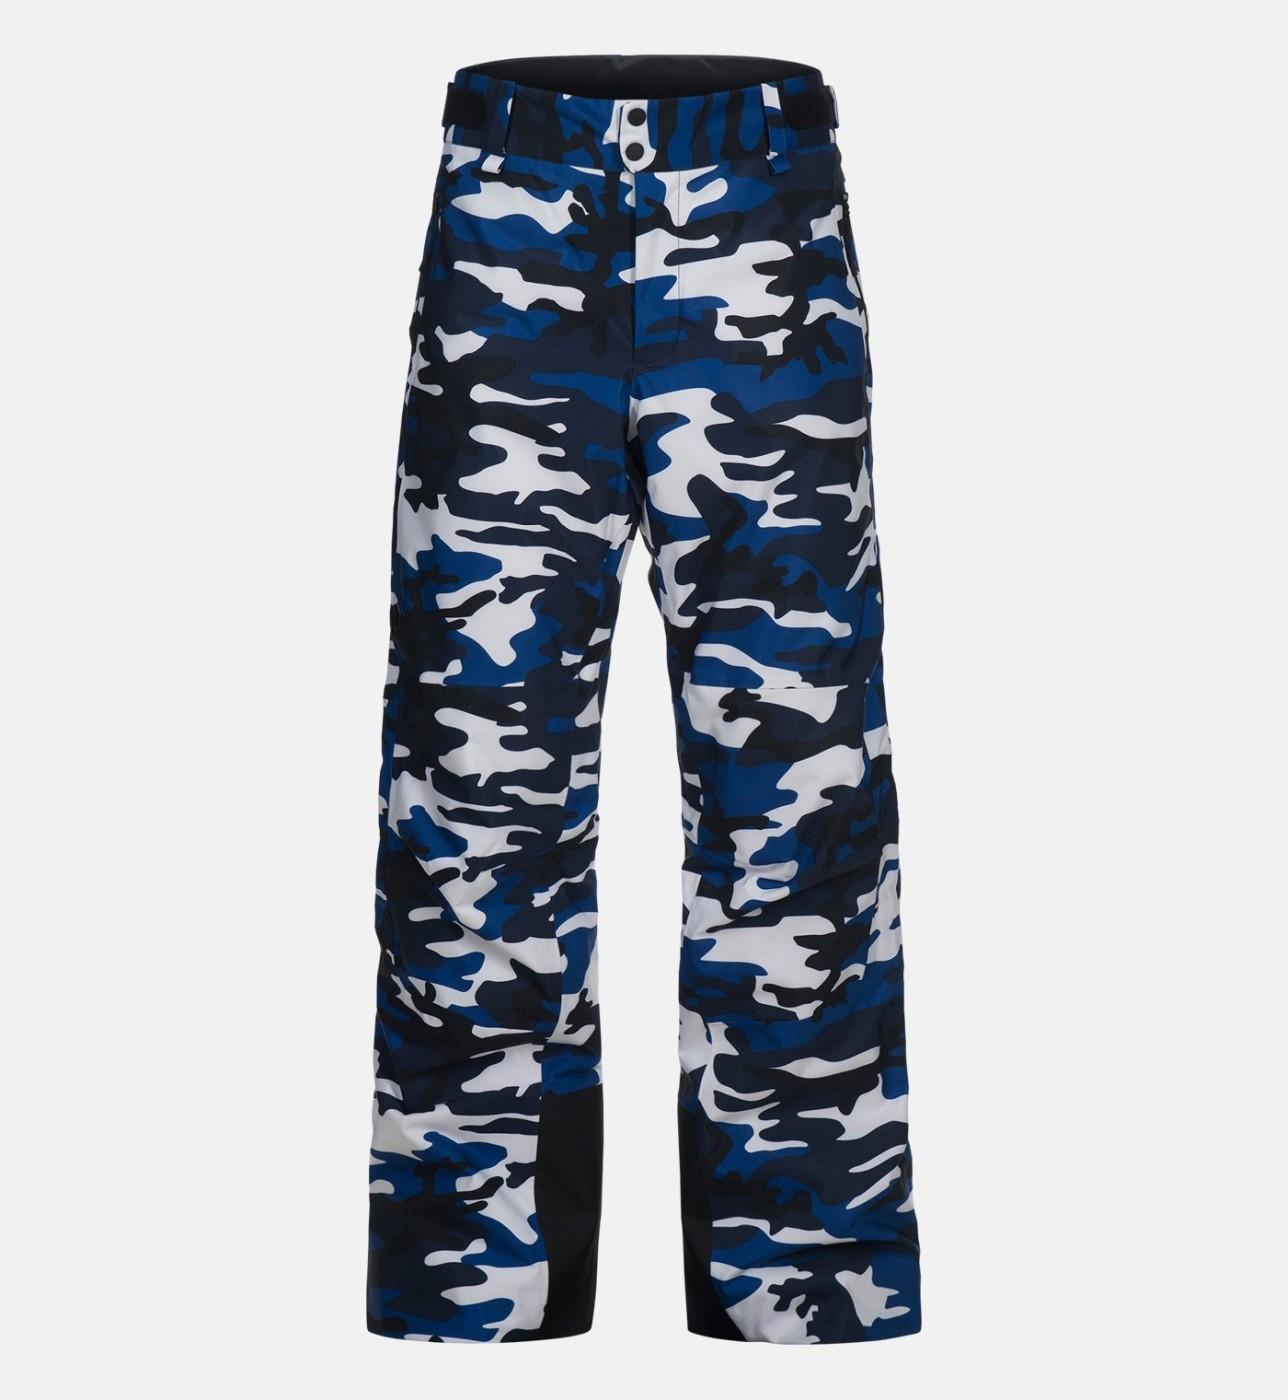 Peak Performance Men s Padded HipeCore+ Maroon Ski Pants Pattern - en f60660559